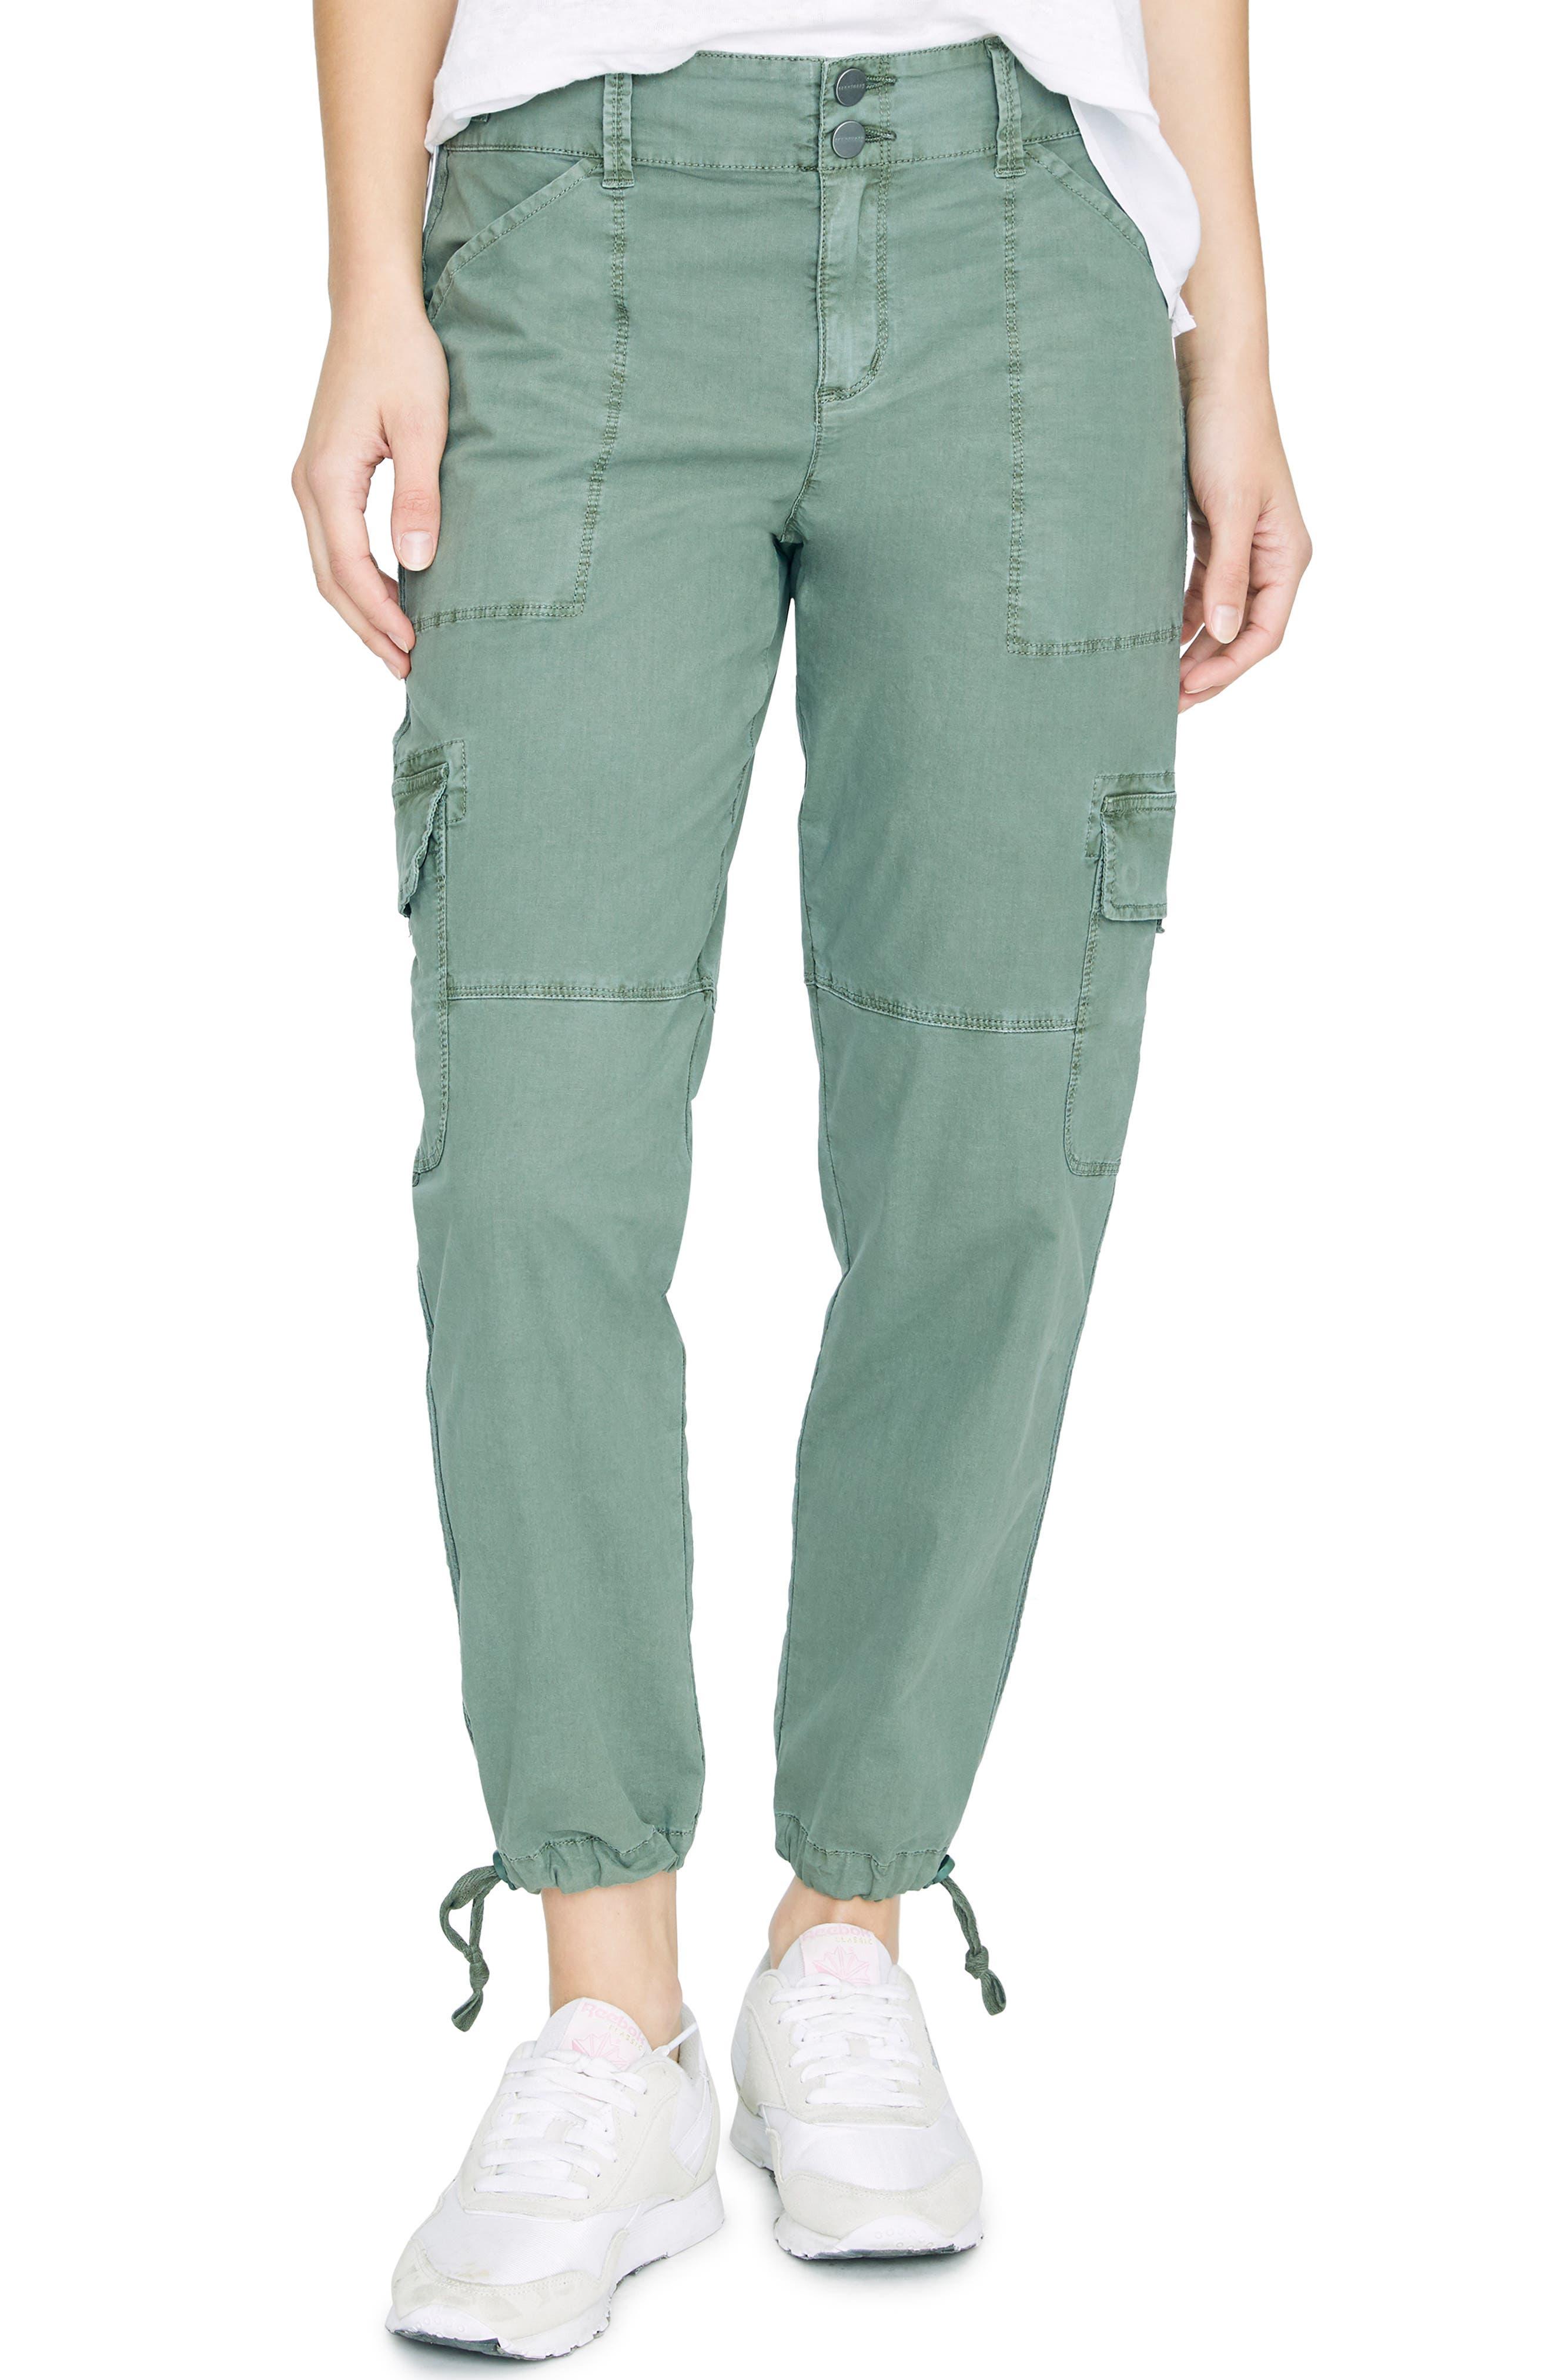 Sanctuary Terrain Crop Cargo Pants, 7 - Green